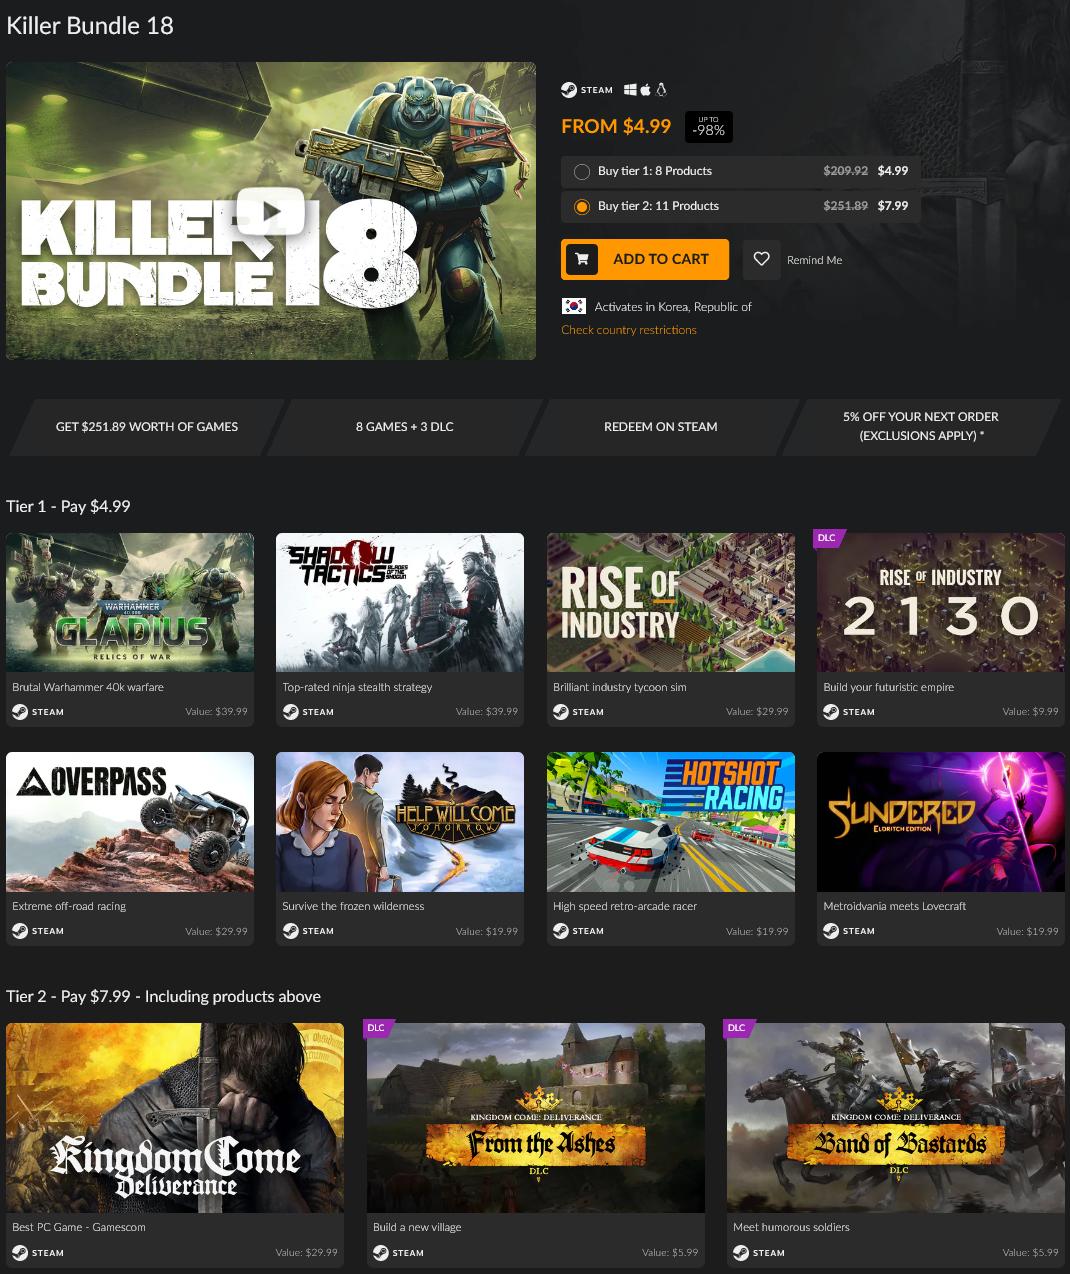 Screenshot 2021-06-29 at 22-50-32 Killer Bundle 18 Steam Game Bundle Fanatical.png